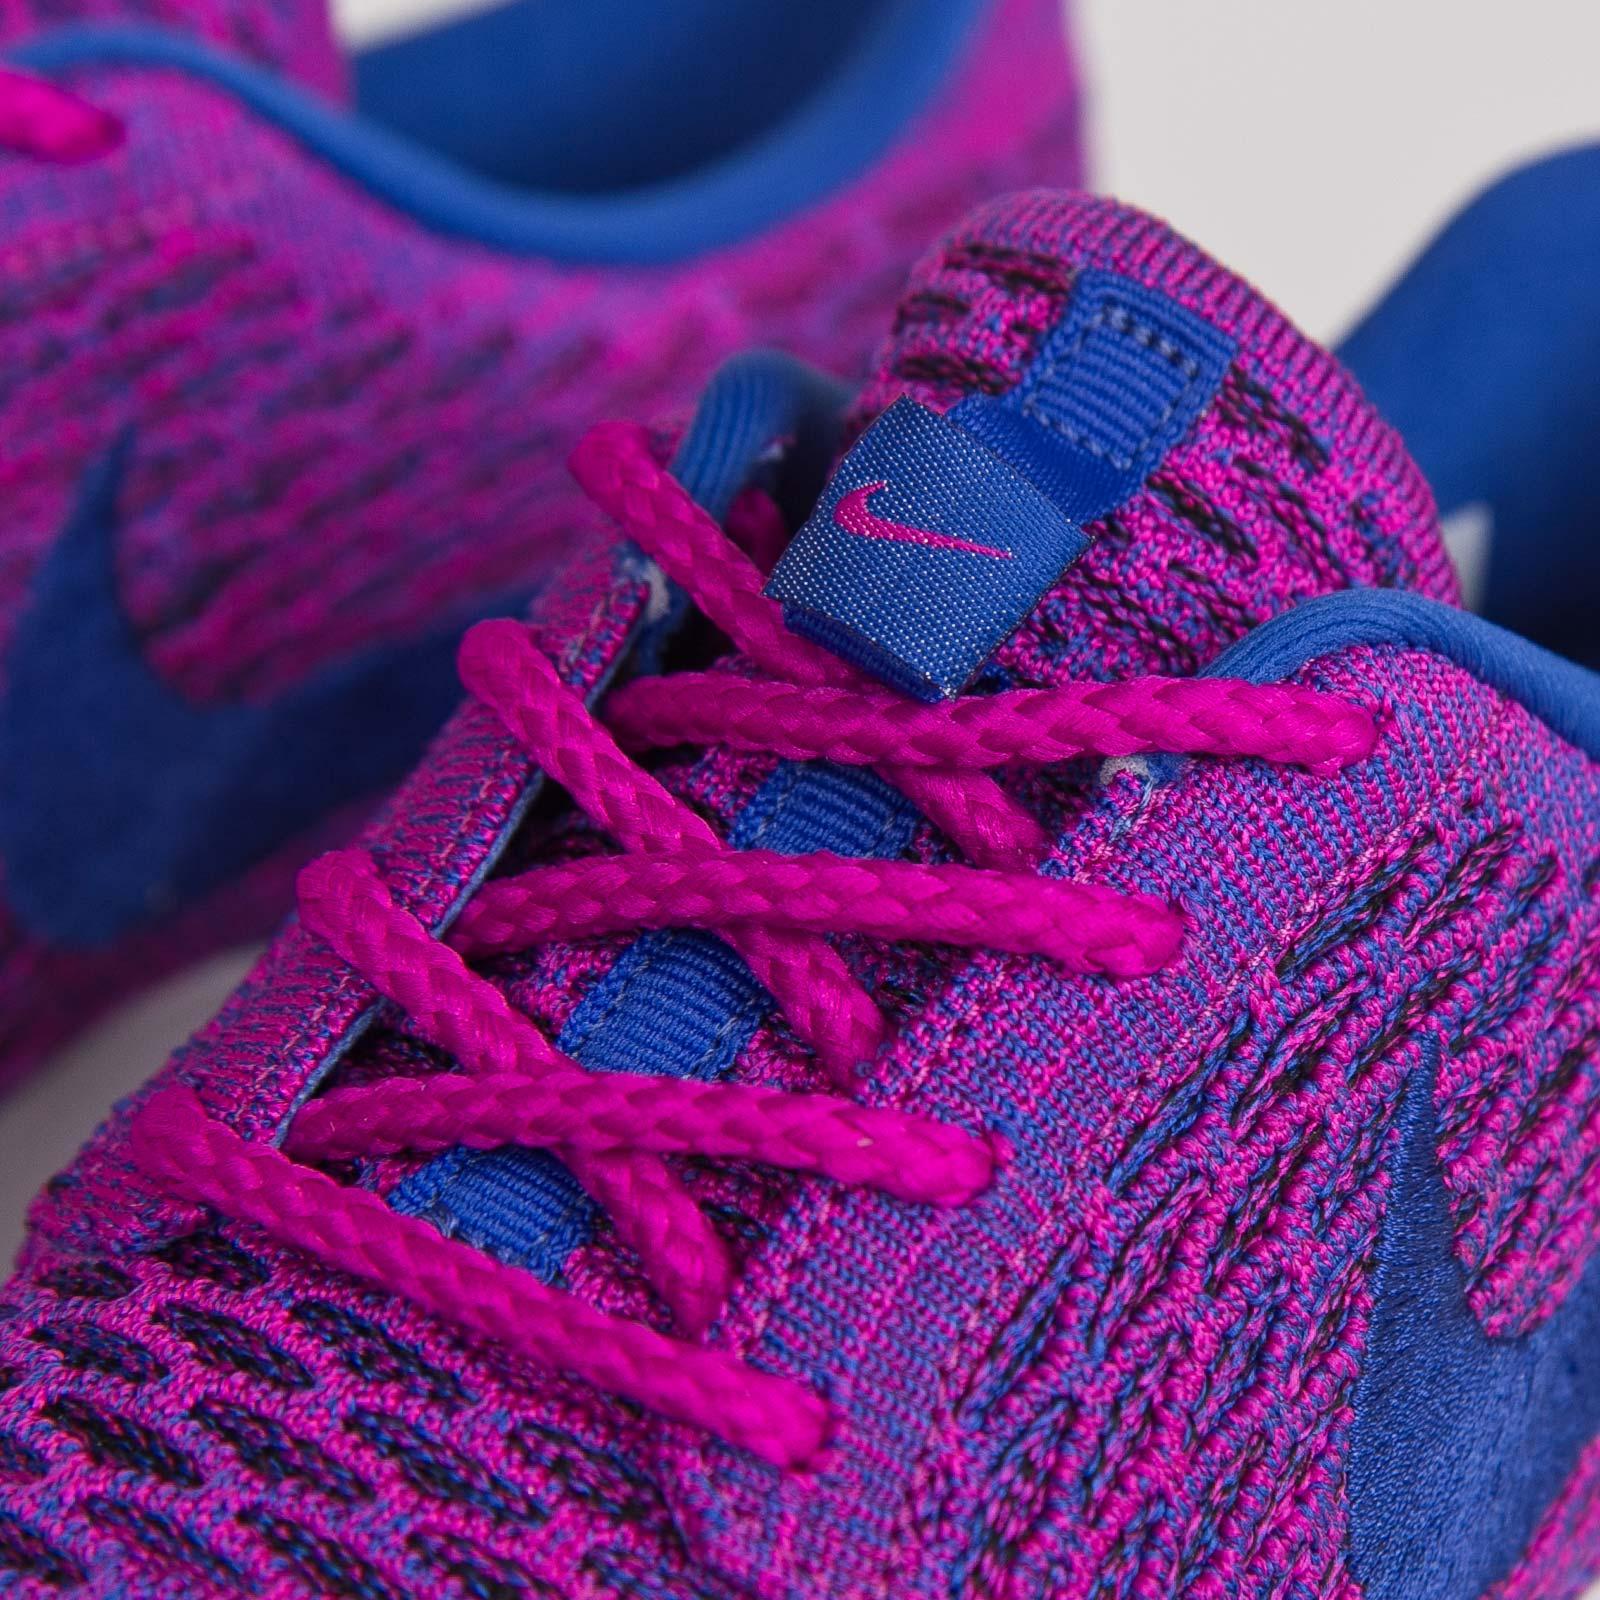 652ab4d03d17 Nike Wmns Roshe One Flyknit - 704927-501 - Sneakersnstuff